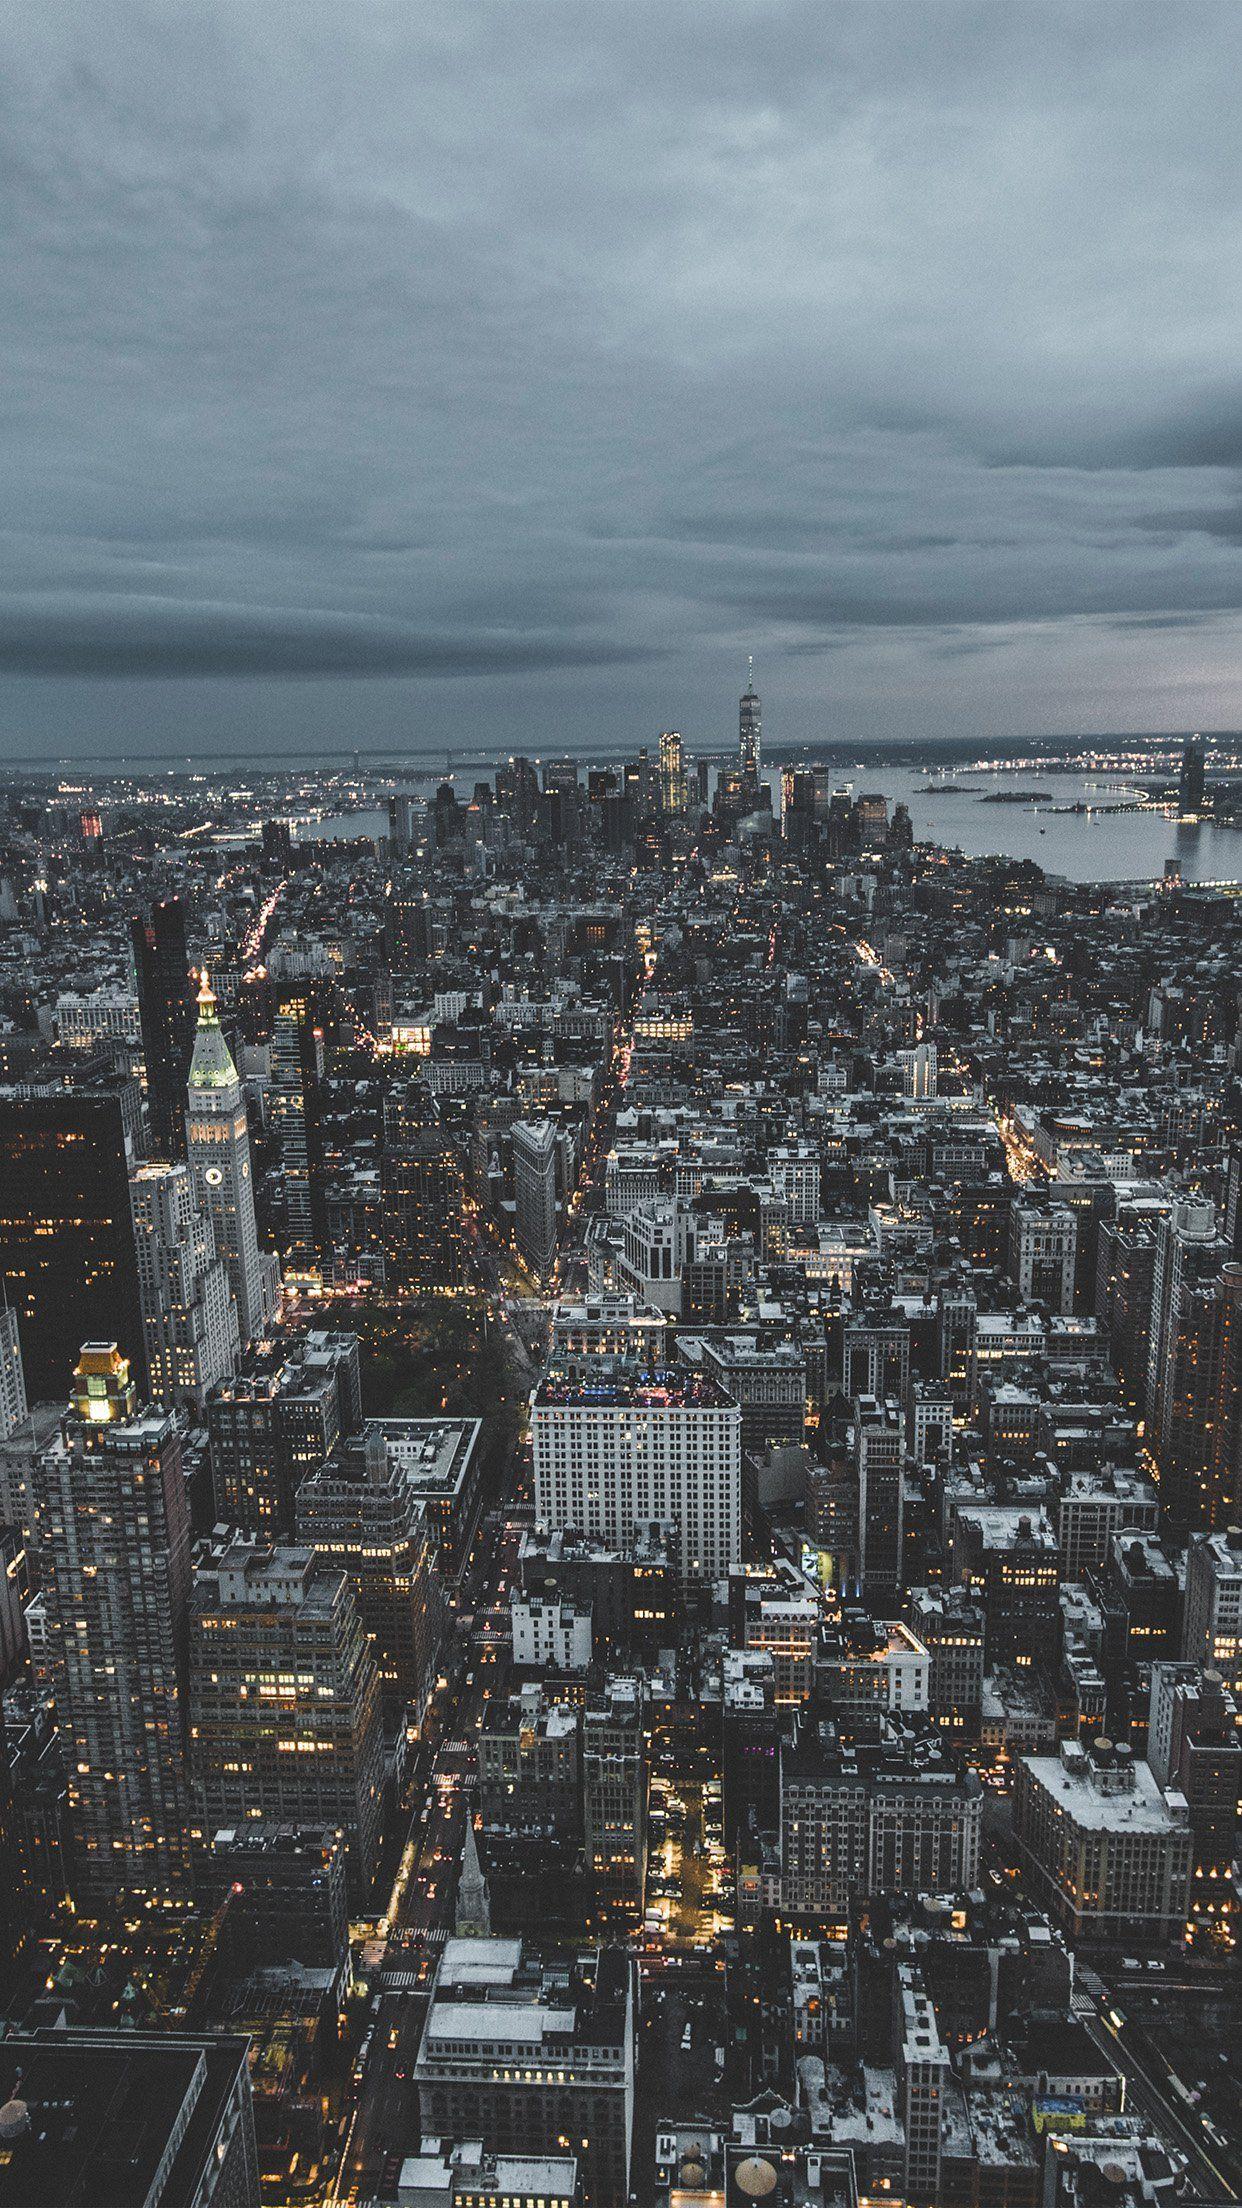 Https All Images Net Wallpaper Iphone New York City 286 Wallpaper Iphone New York City 286 New York Iphone Wallpaper City Wallpaper City Sky